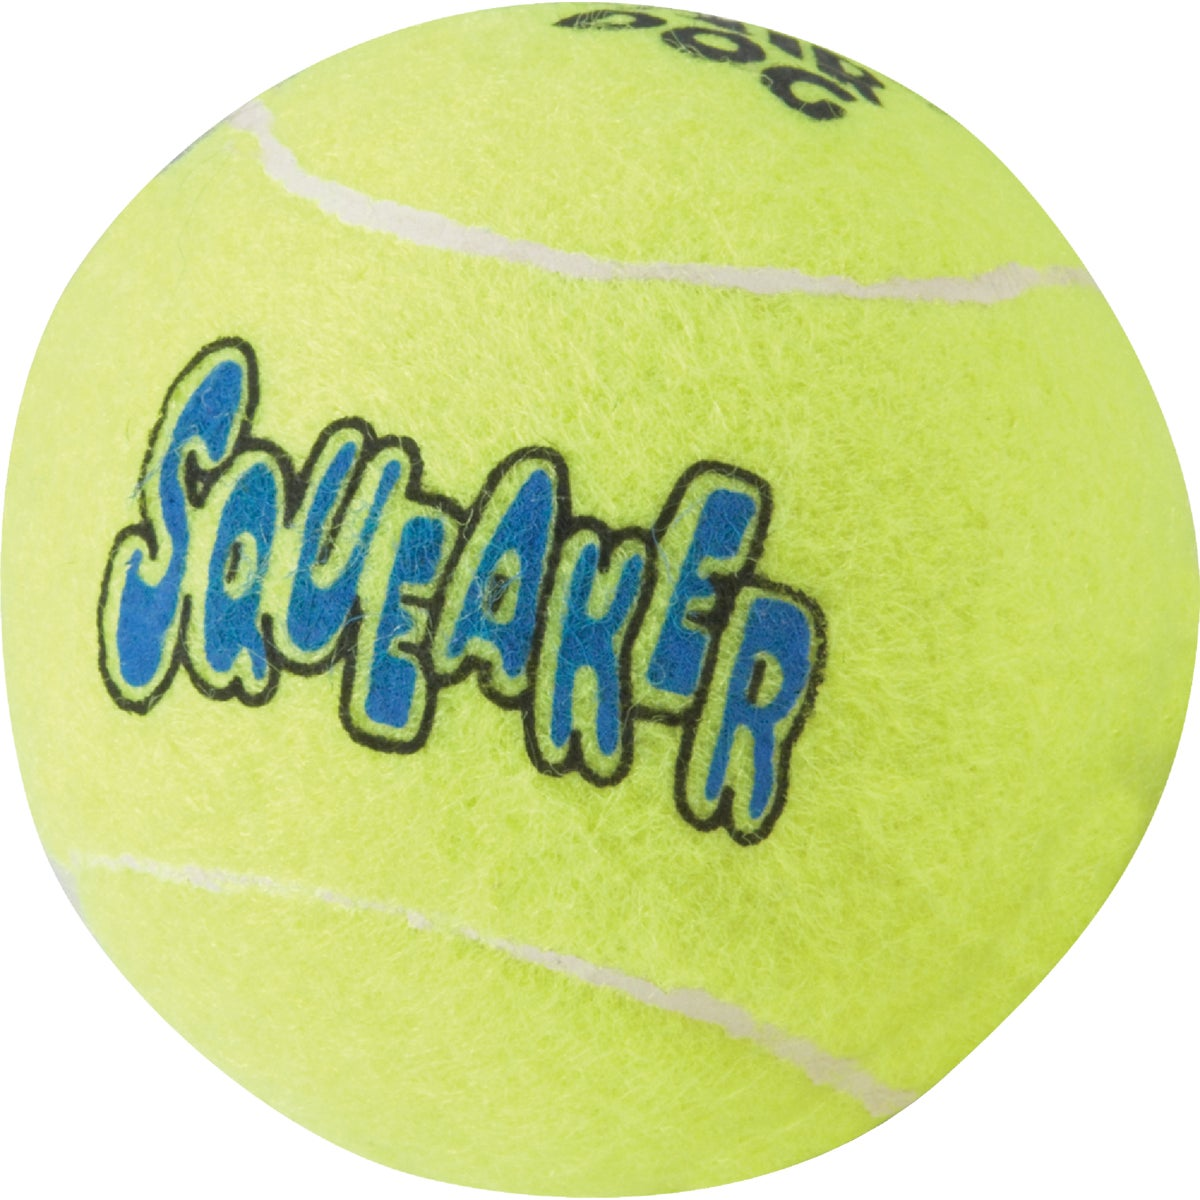 KONG SQUEAKER BALL - AST1B by Kong Company